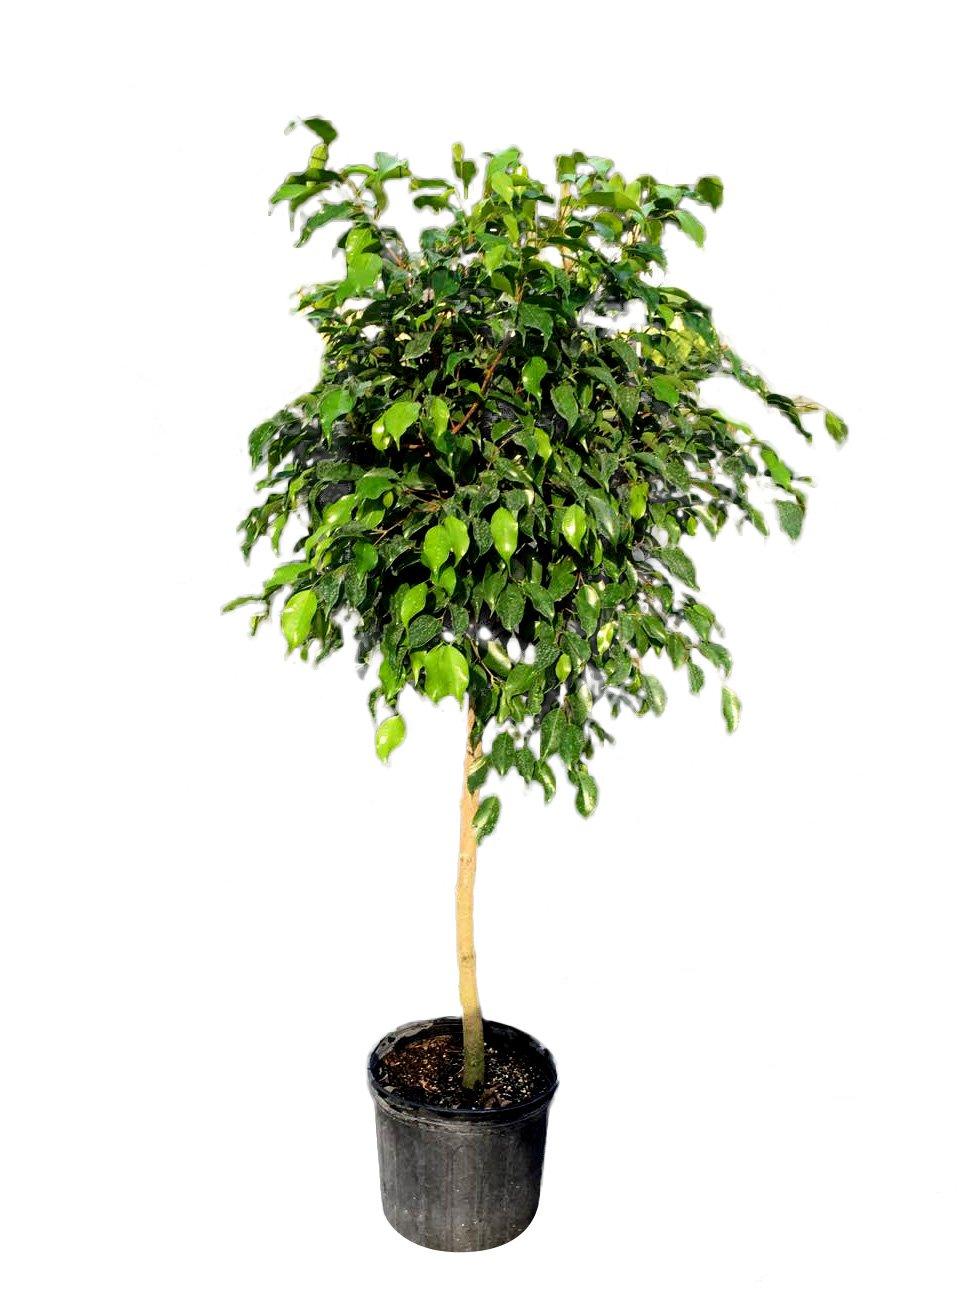 Ficus benjamina 'Wintergreen', Weeping Fig - 3 Gallon Live Plant